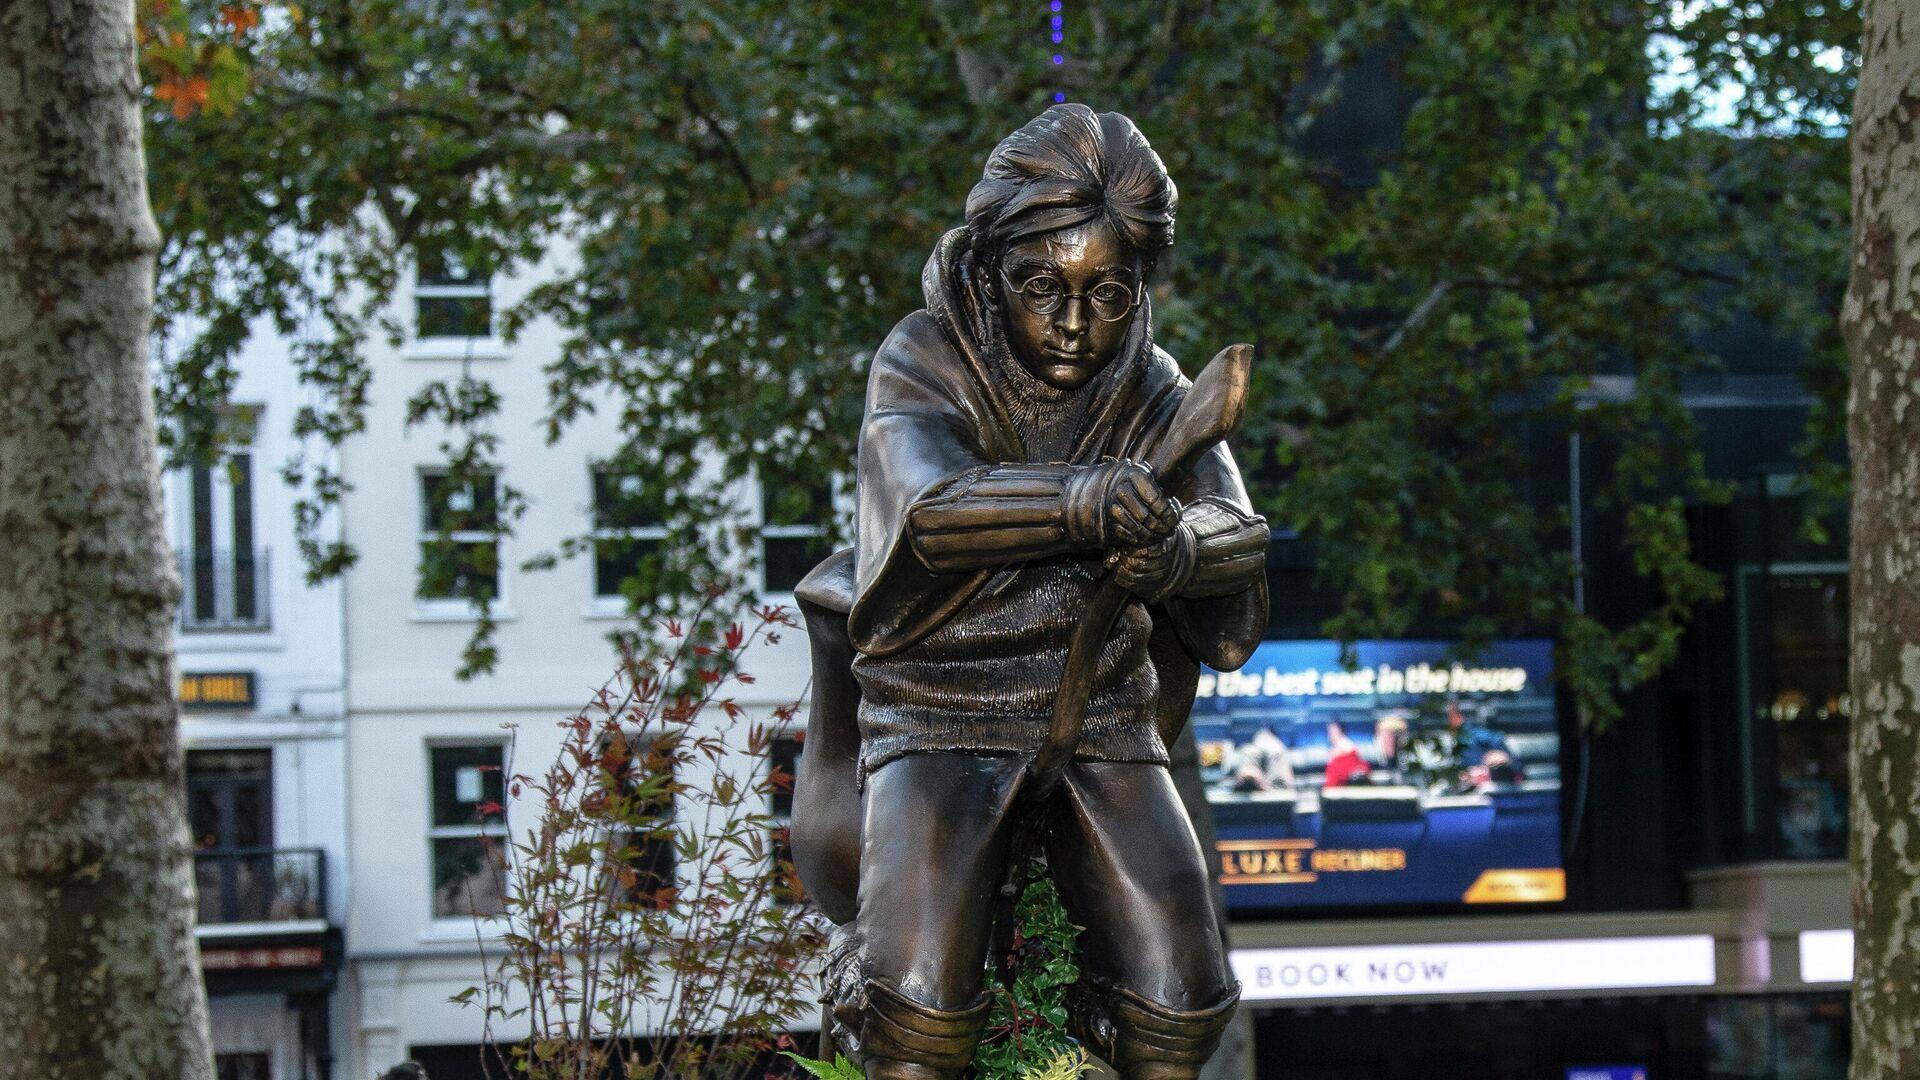 Il: встолице Англии  открыли монумент  Гарри Поттеру